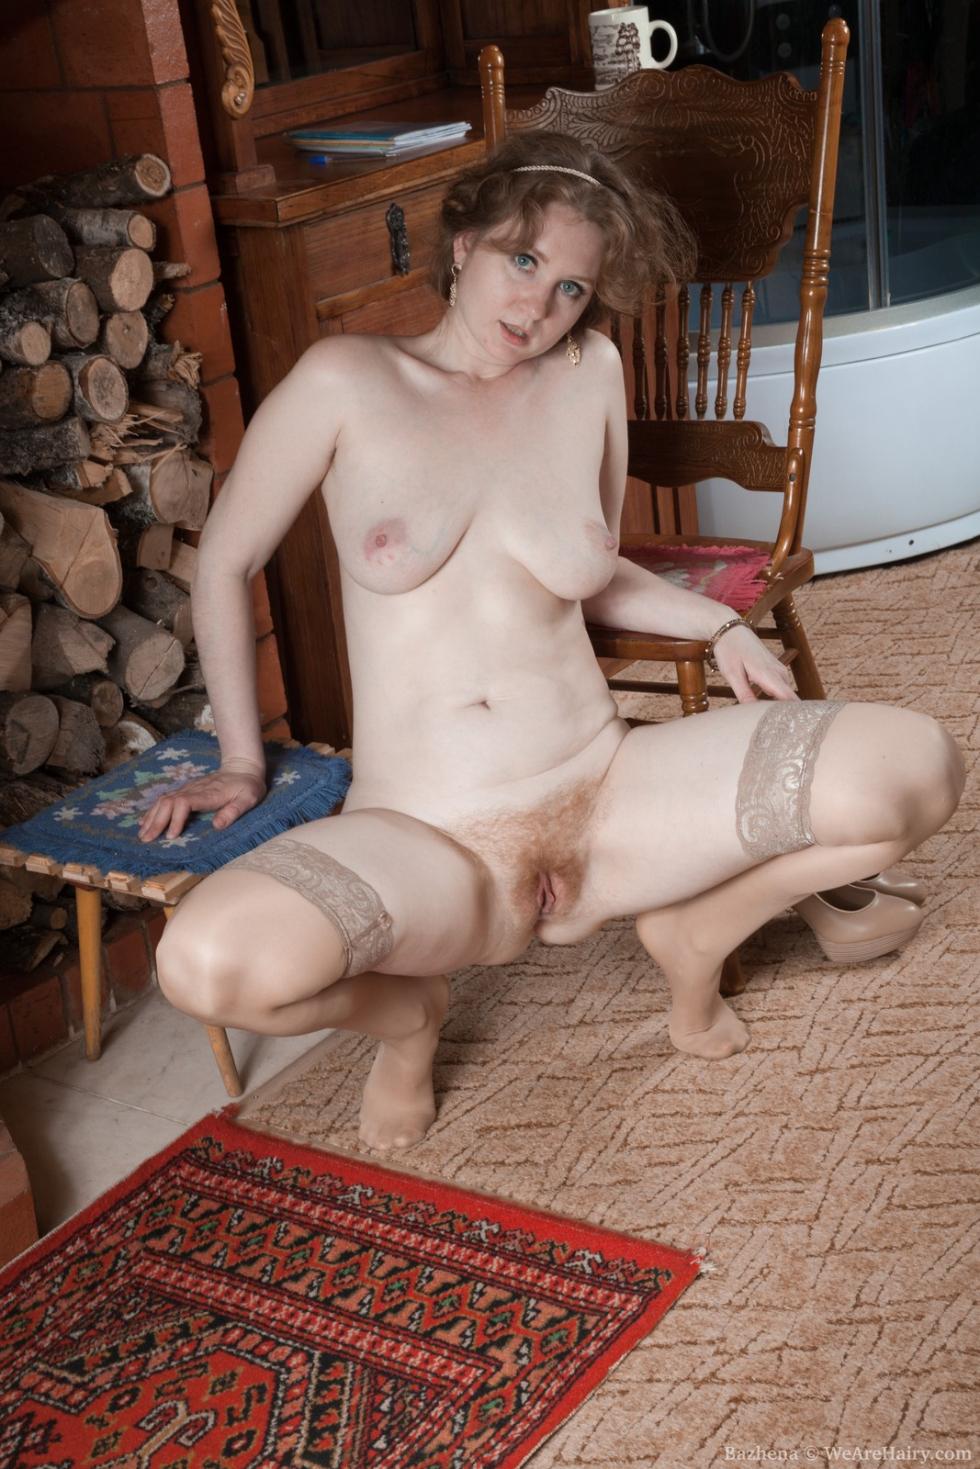 Mimi lea enjoys a candy cane and strips naked 6